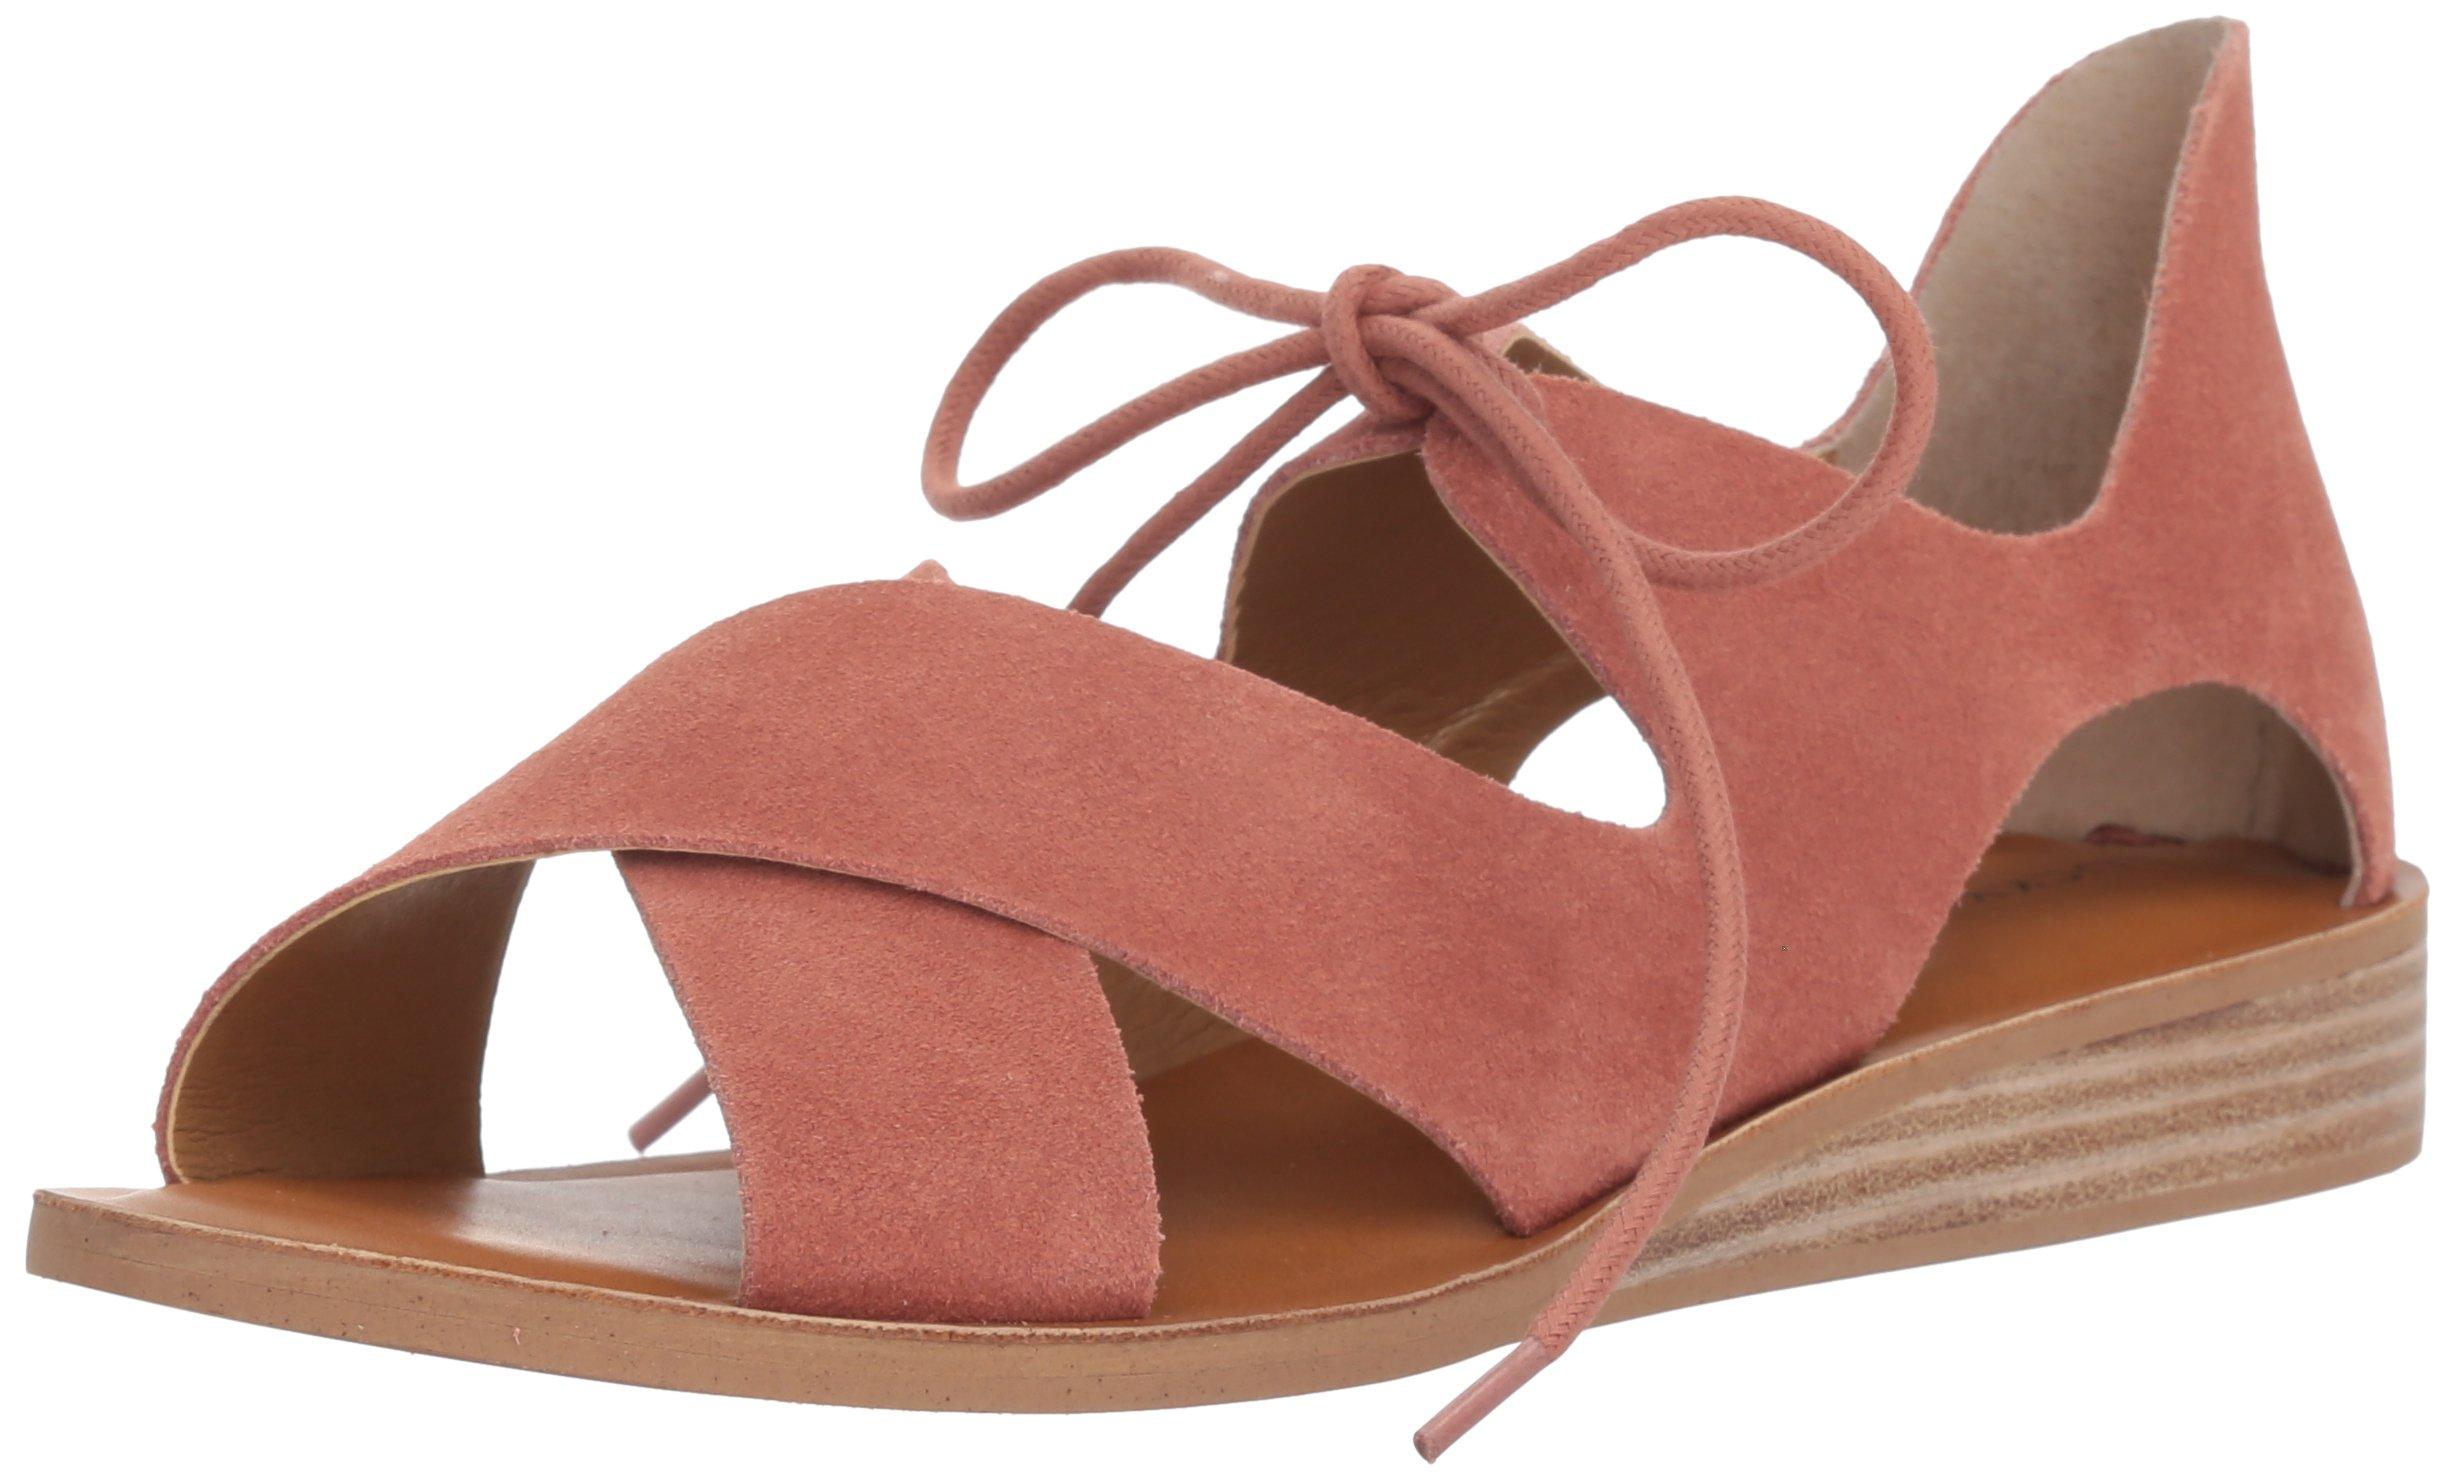 Lucky Brand Women's Hafsa Flat Sandal, Canyon Rose, 7.5 M US